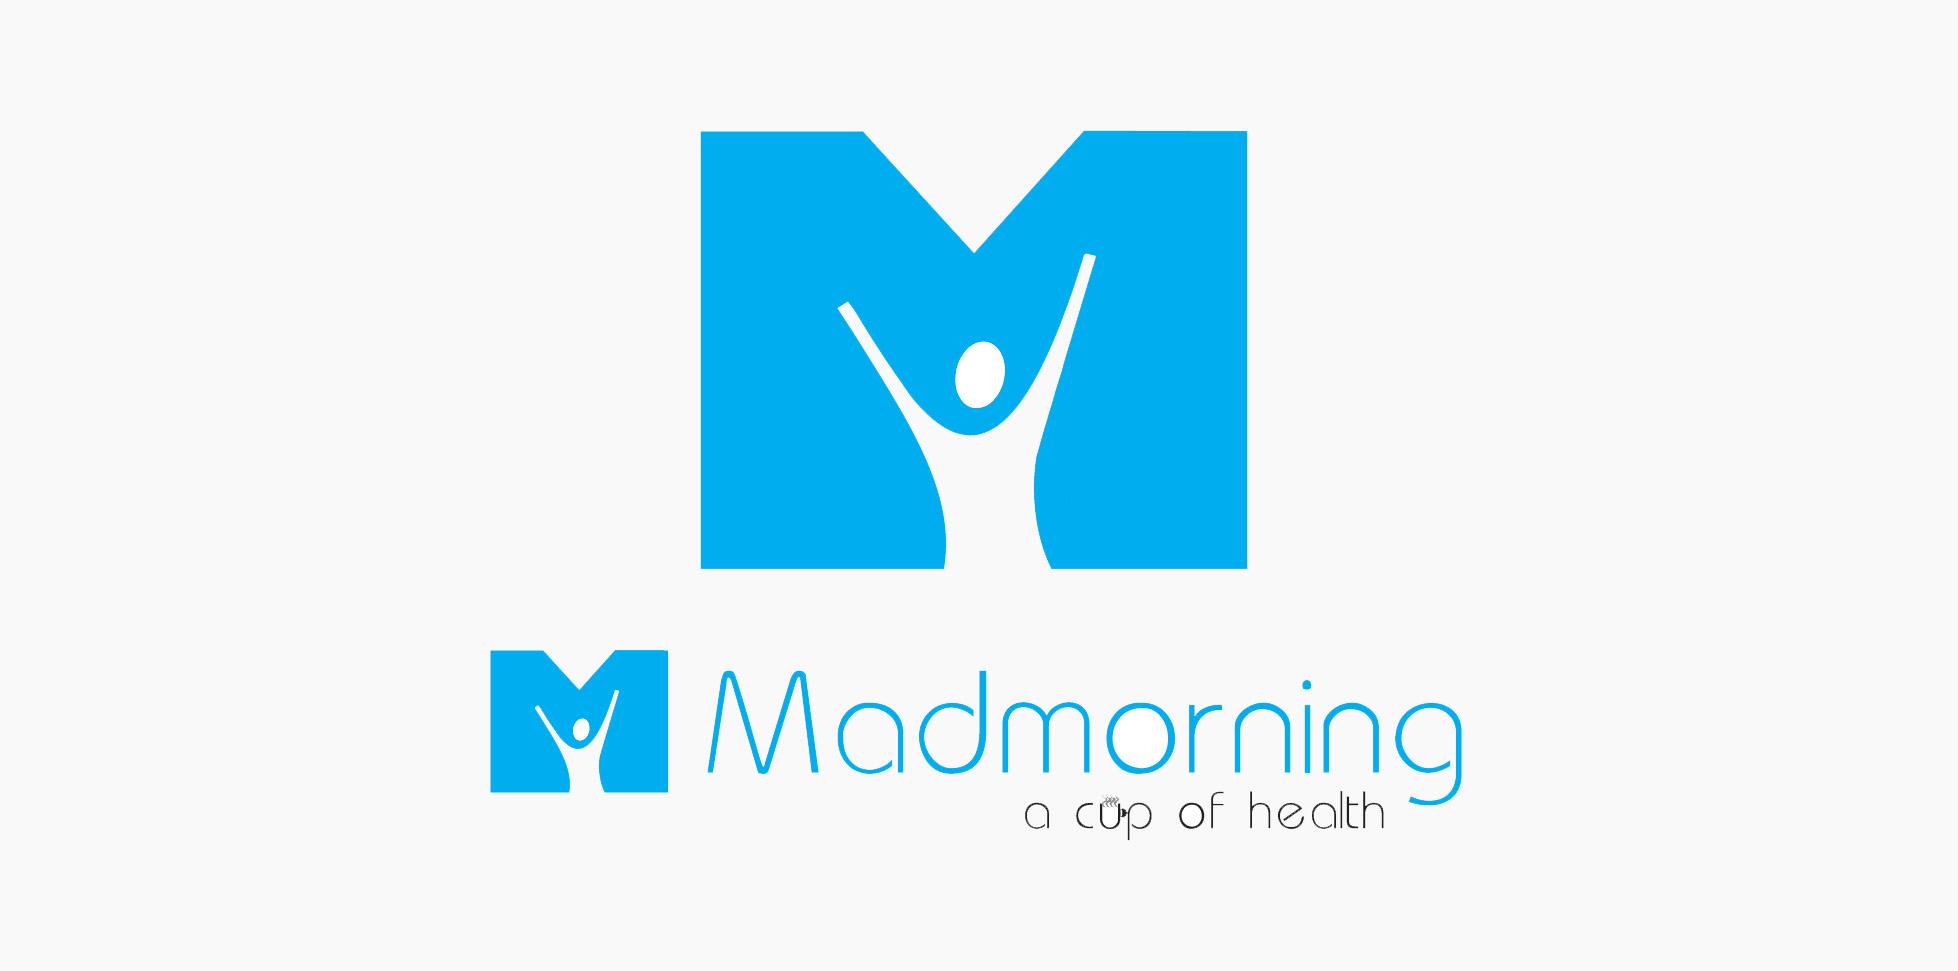 Mad Morning